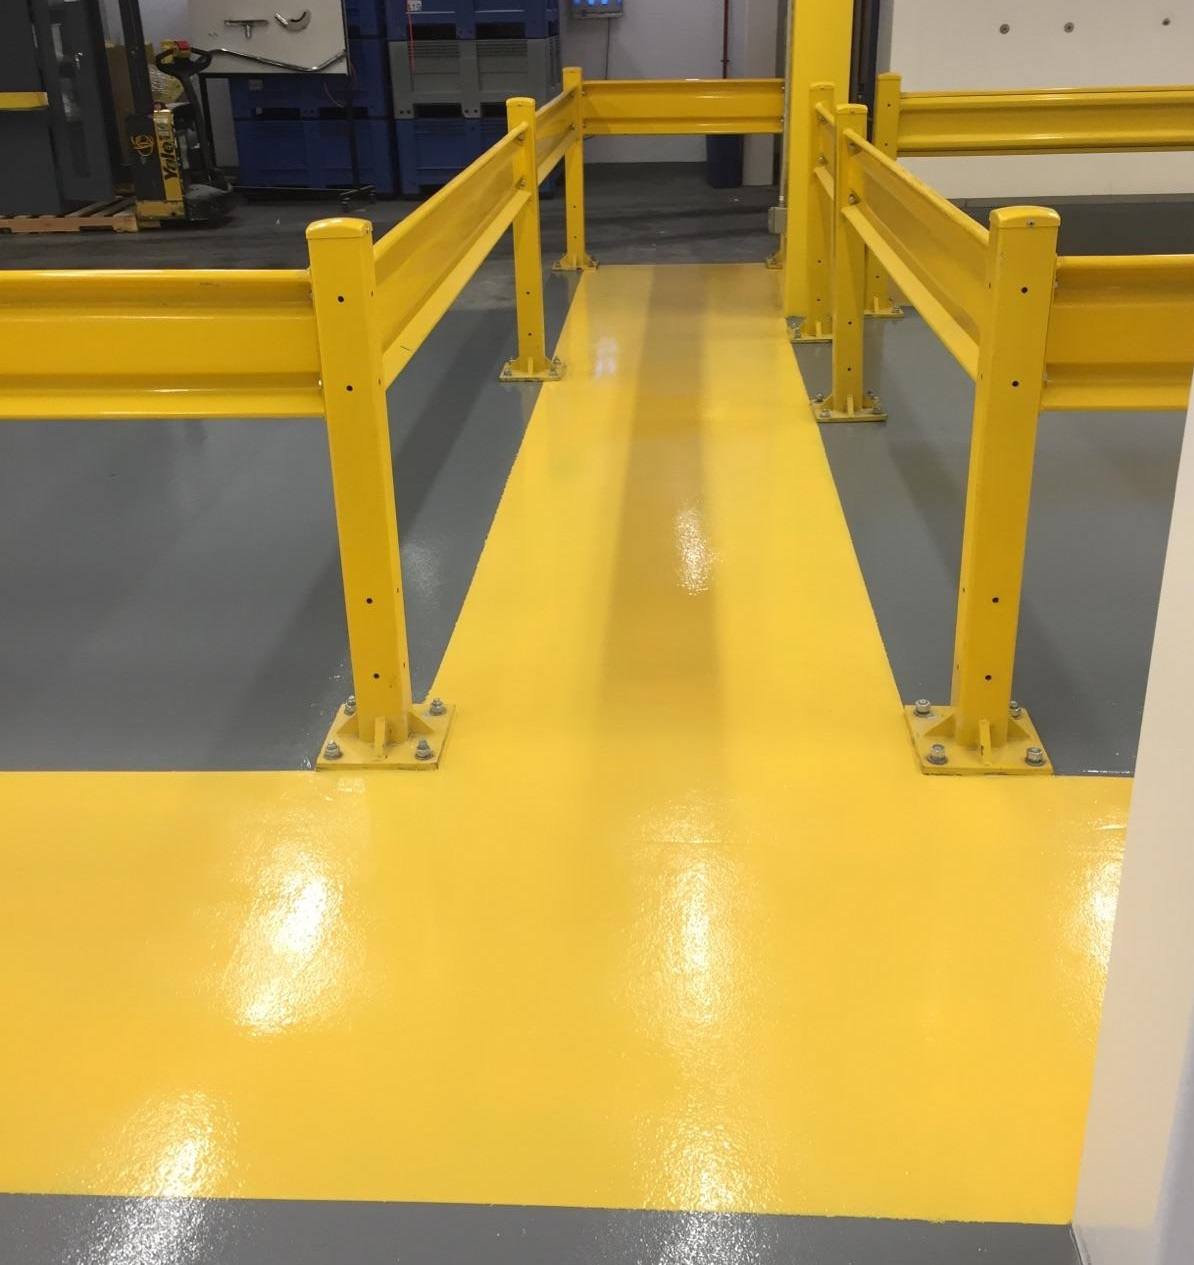 polyaspartic floor coating, epoxy floor coatings, industrial floor coatings